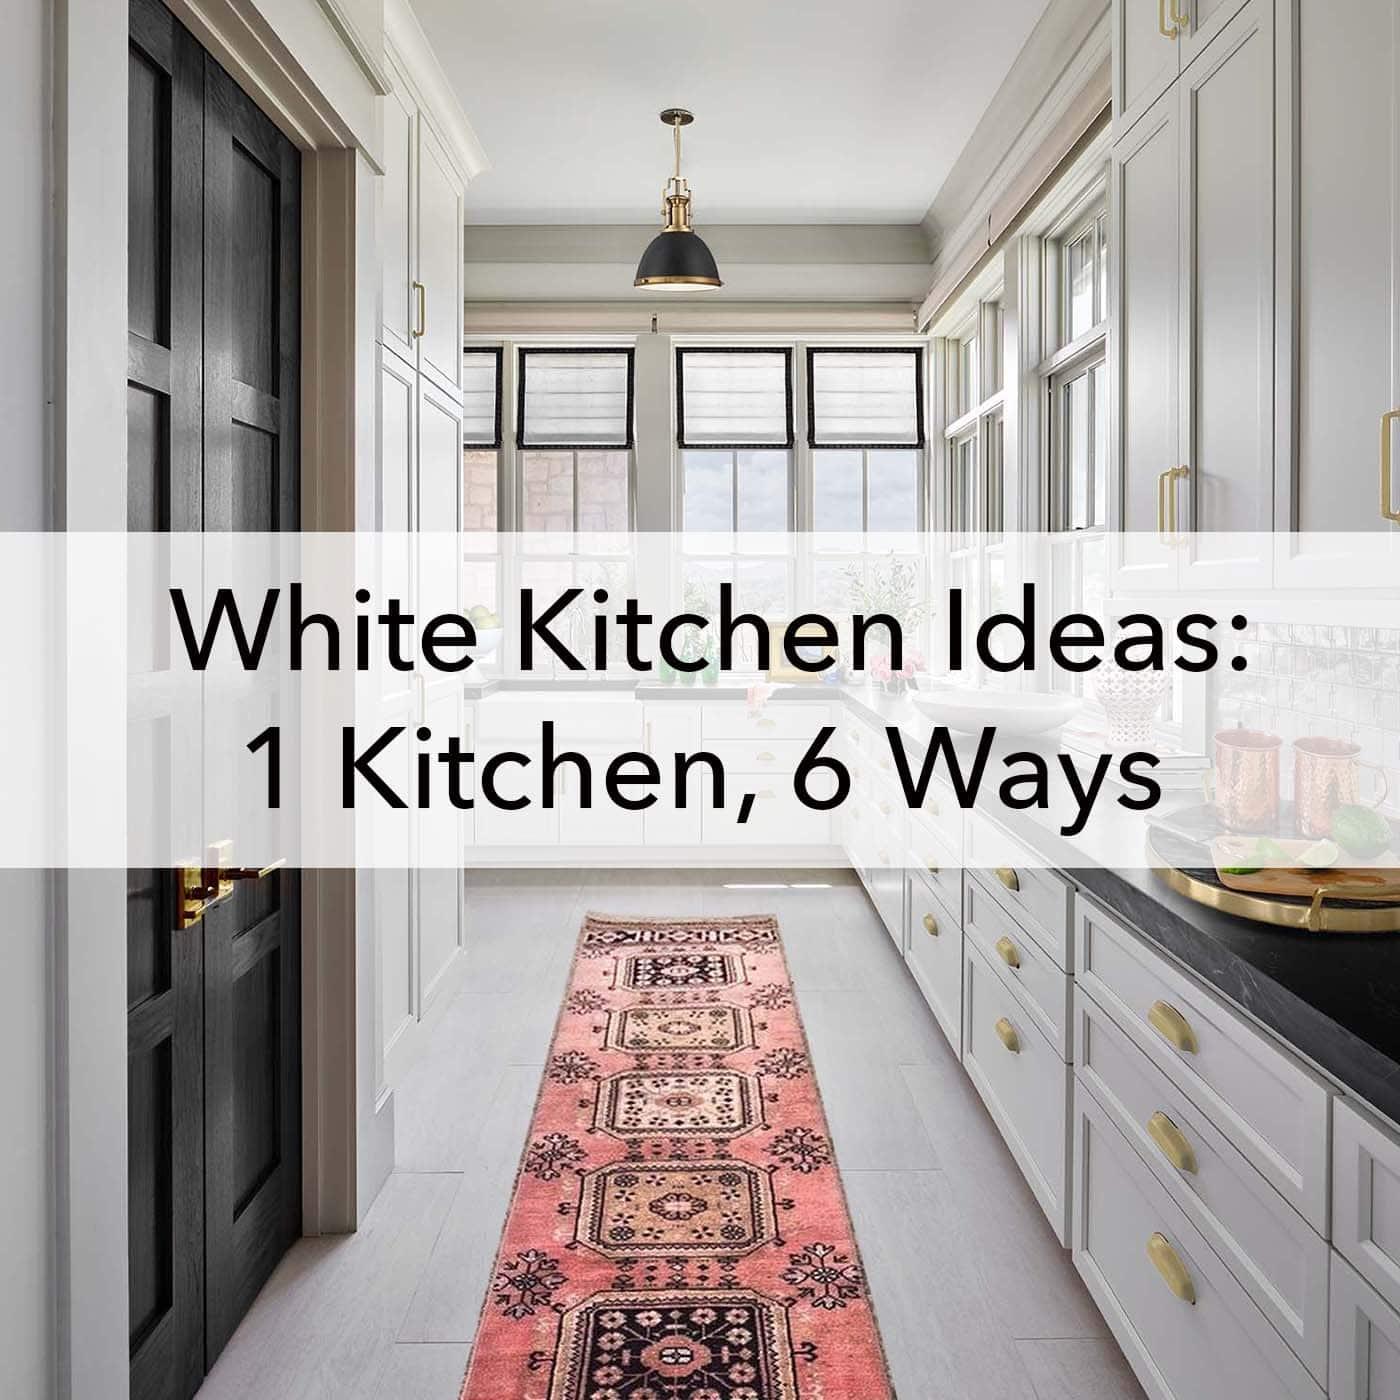 White Kitchen Ideas 1 6 Ways Paper Moon Painting